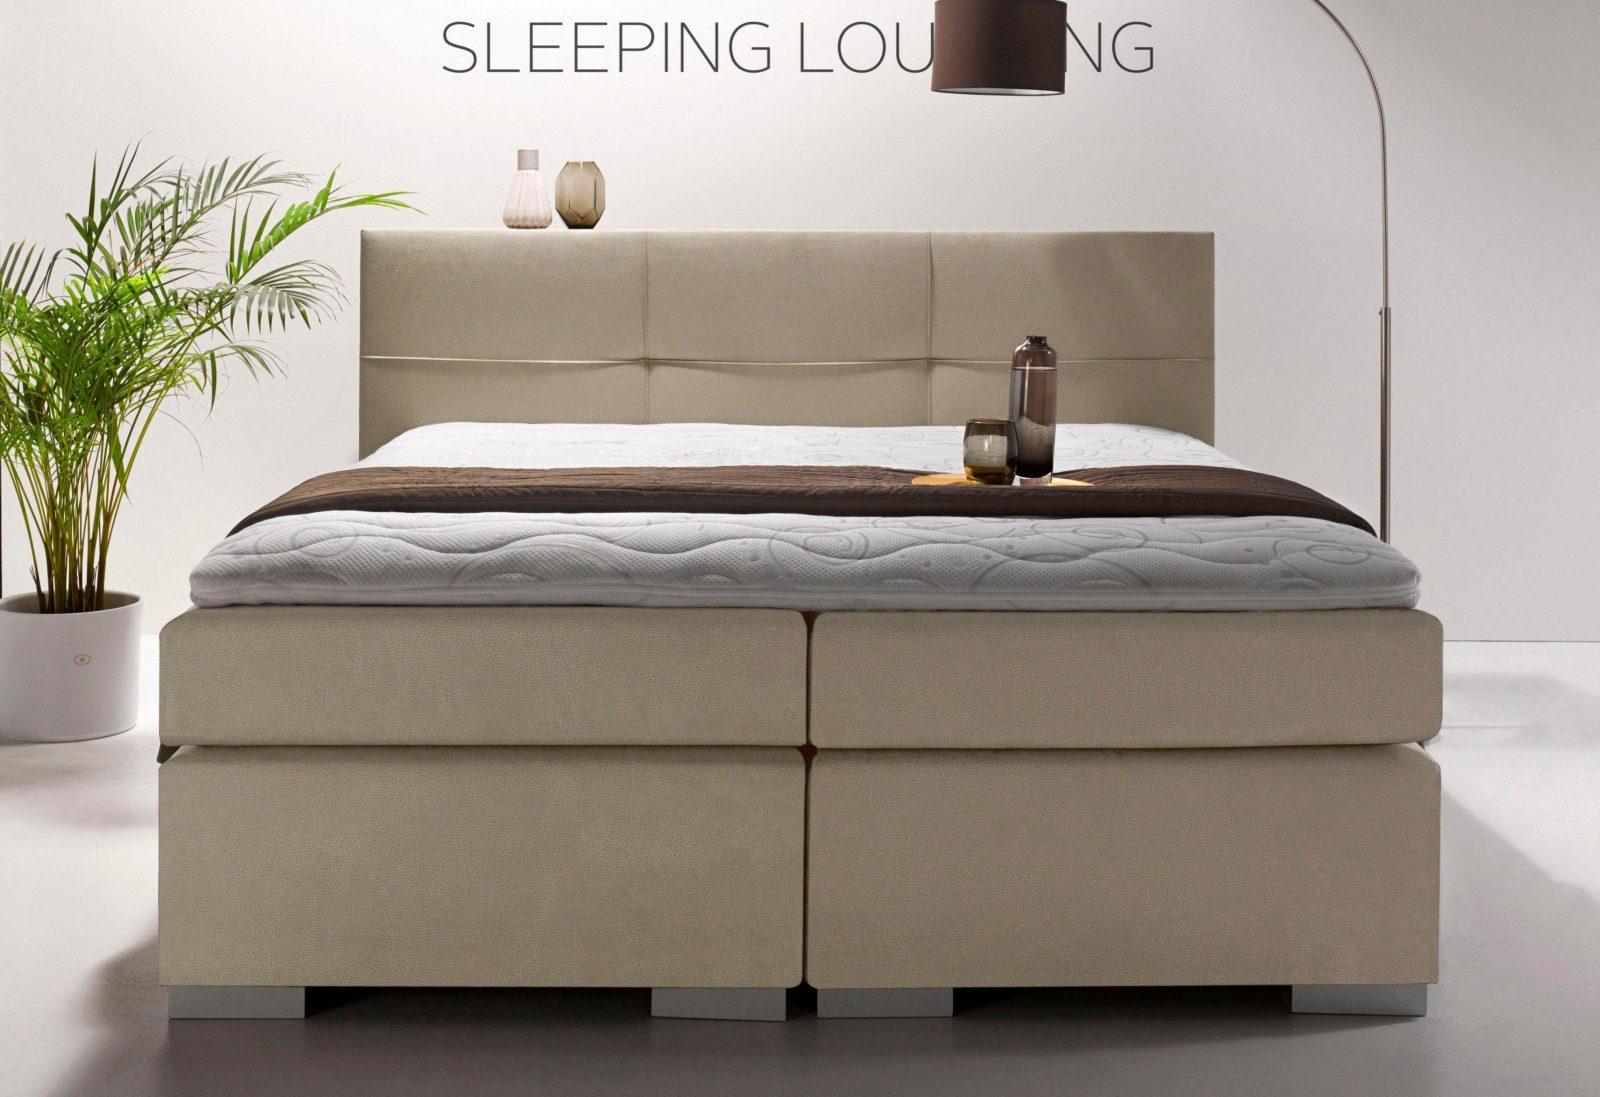 "Tolle Bett ""gravelines"" Zum Boxspringbett Inkl Topper  Schlafzimmer von Breckle Boxspringbett Inkl. Topper Bild"